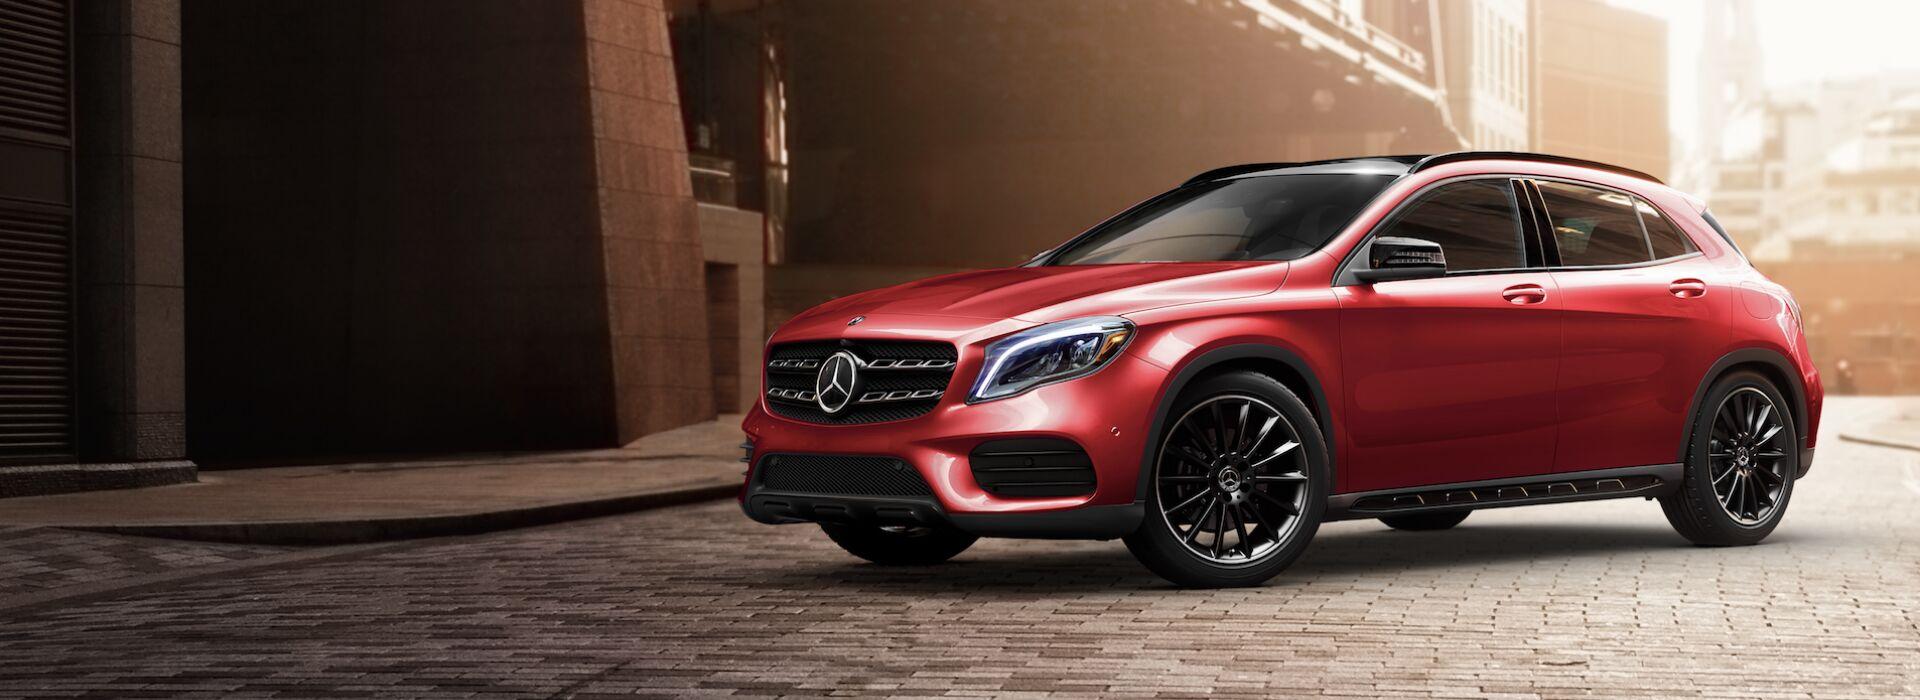 Mercedes-Benz Dealership Chicago IL   Used Cars Loeber Motors